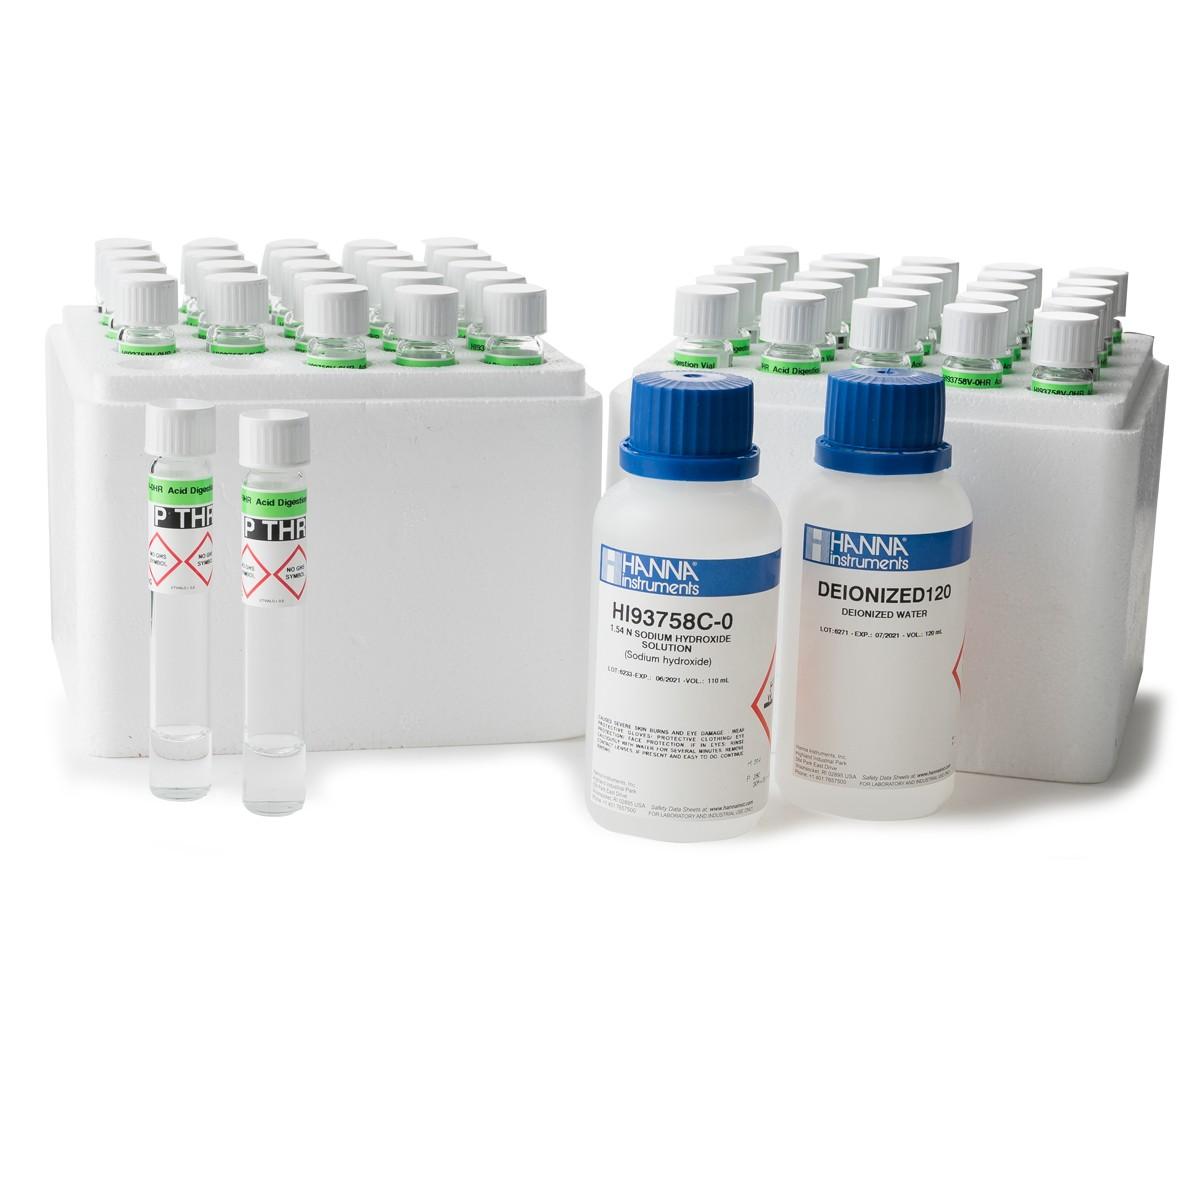 Total Phosphorus High Range Reagents - HI93763B-50